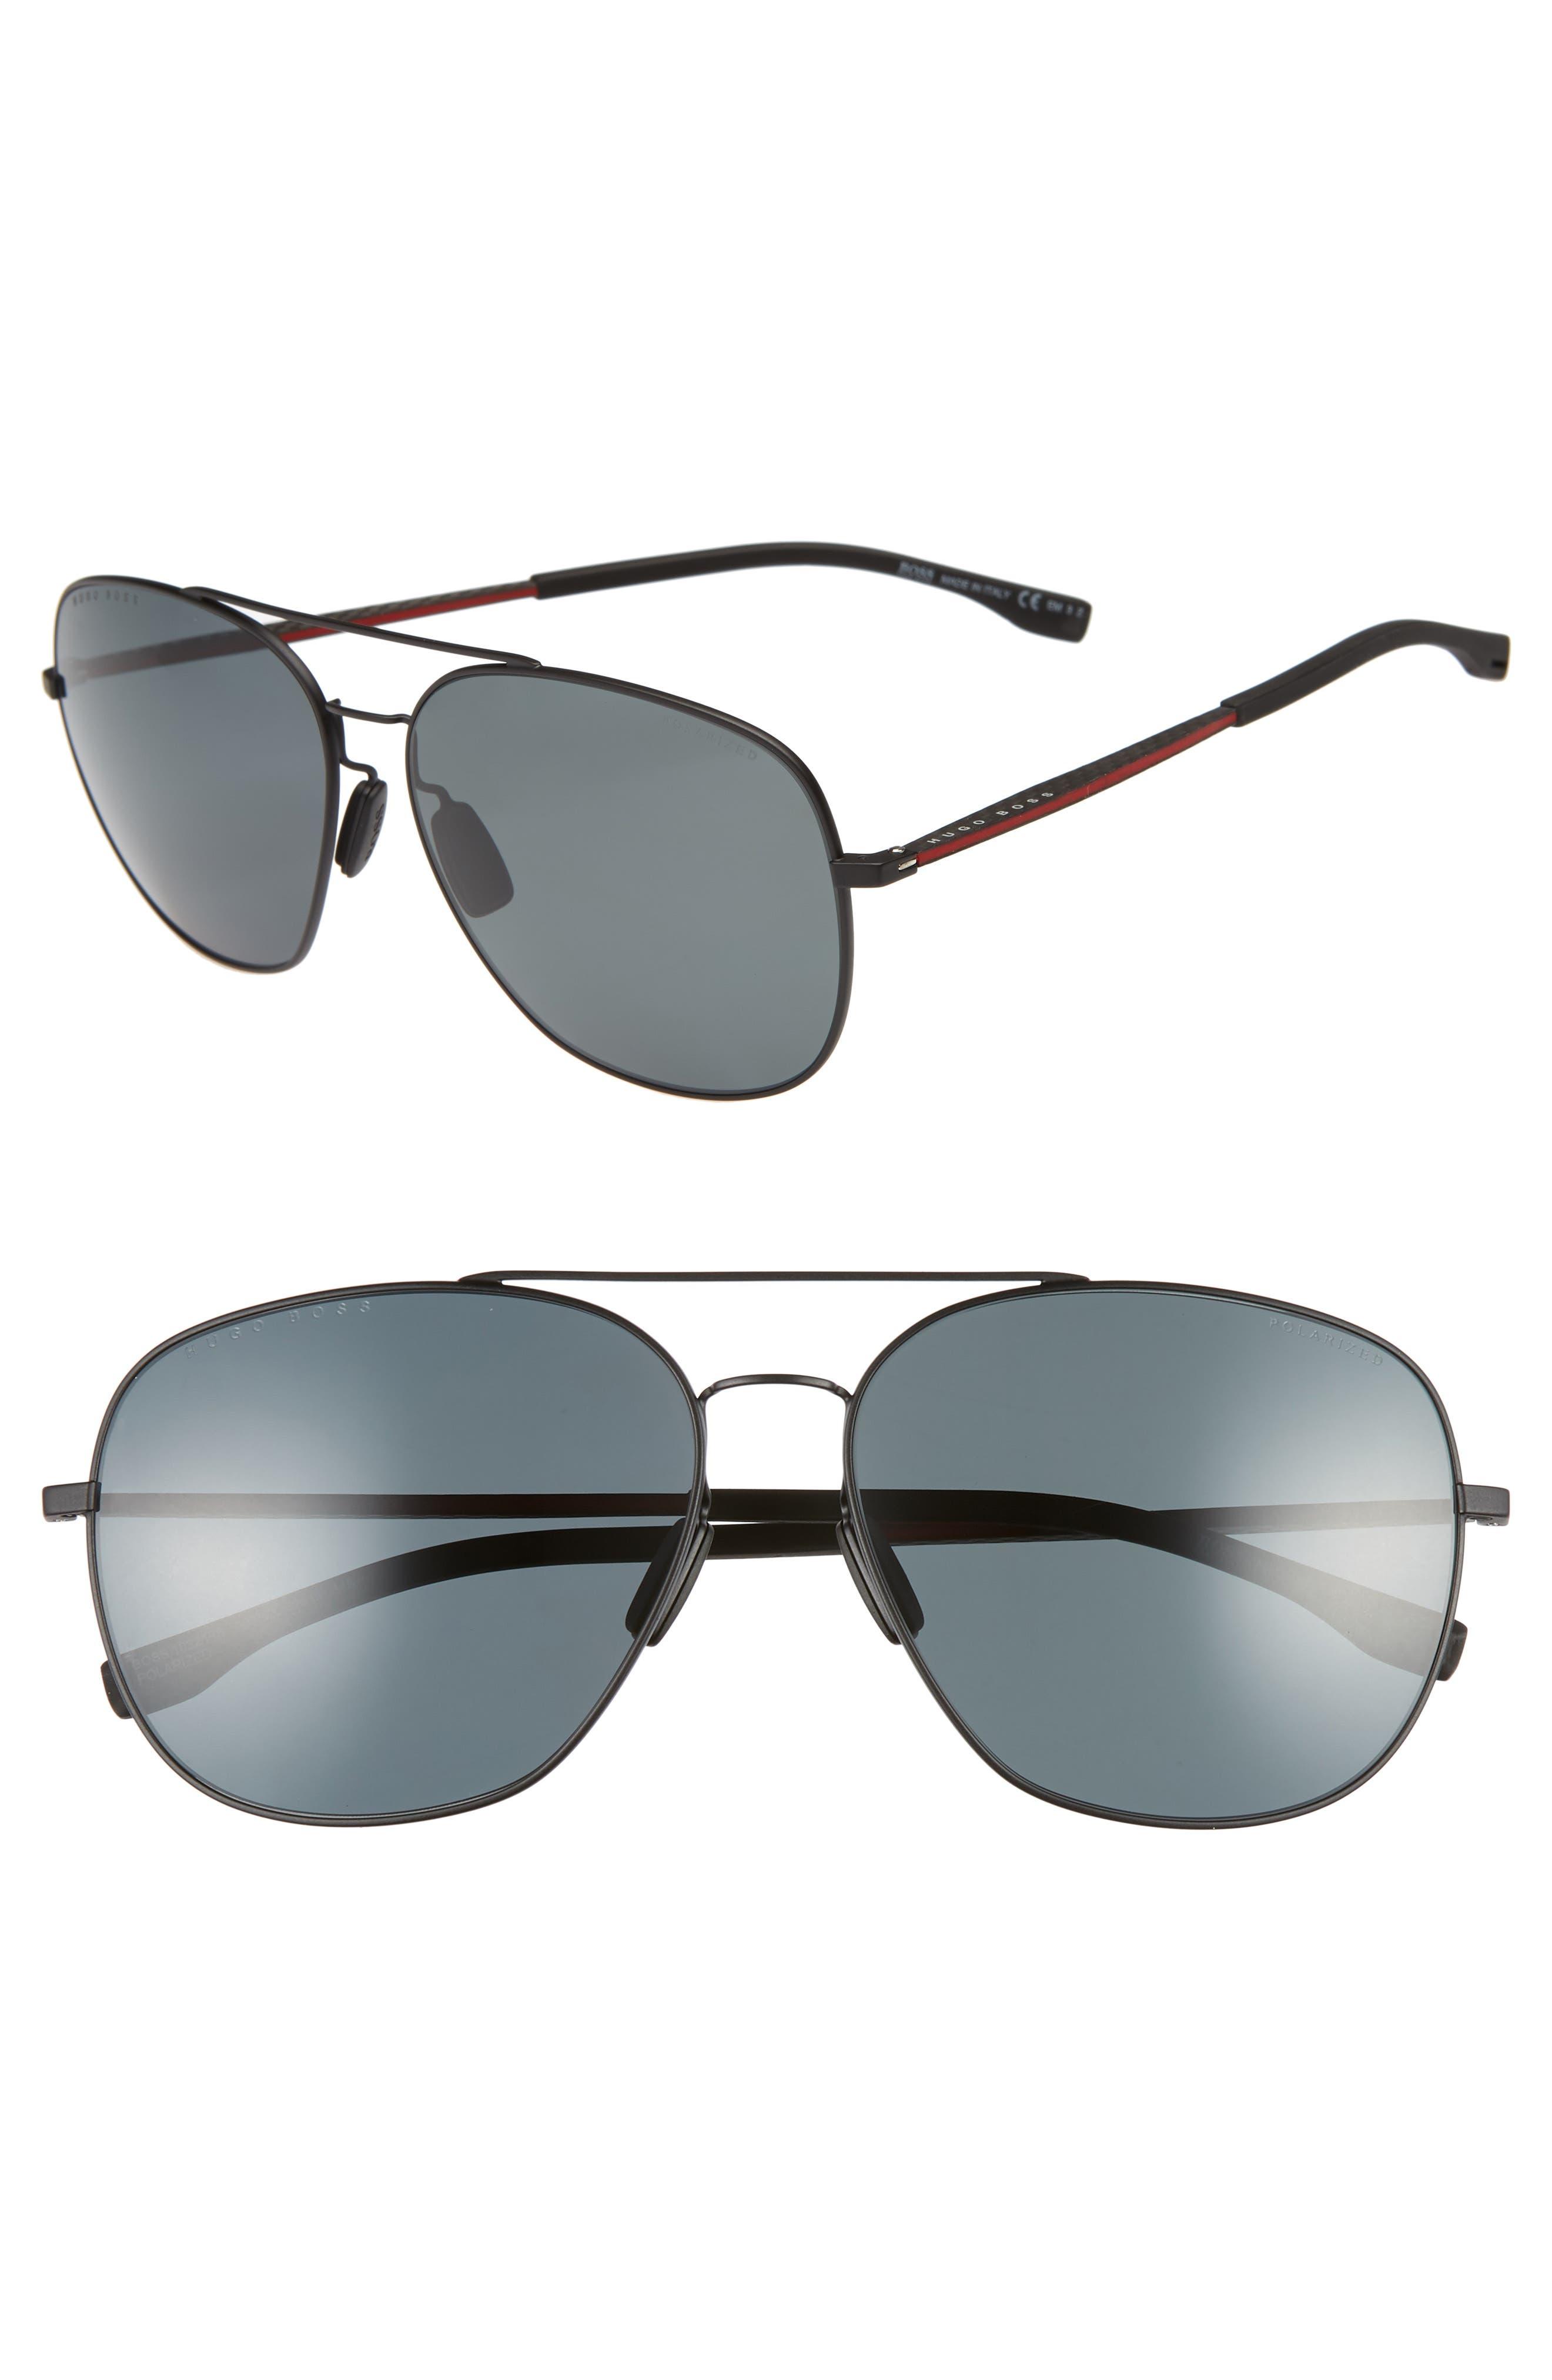 62mm Polarized Special Fit Aviator Sunglasses,                         Main,                         color, MATTE BLACK